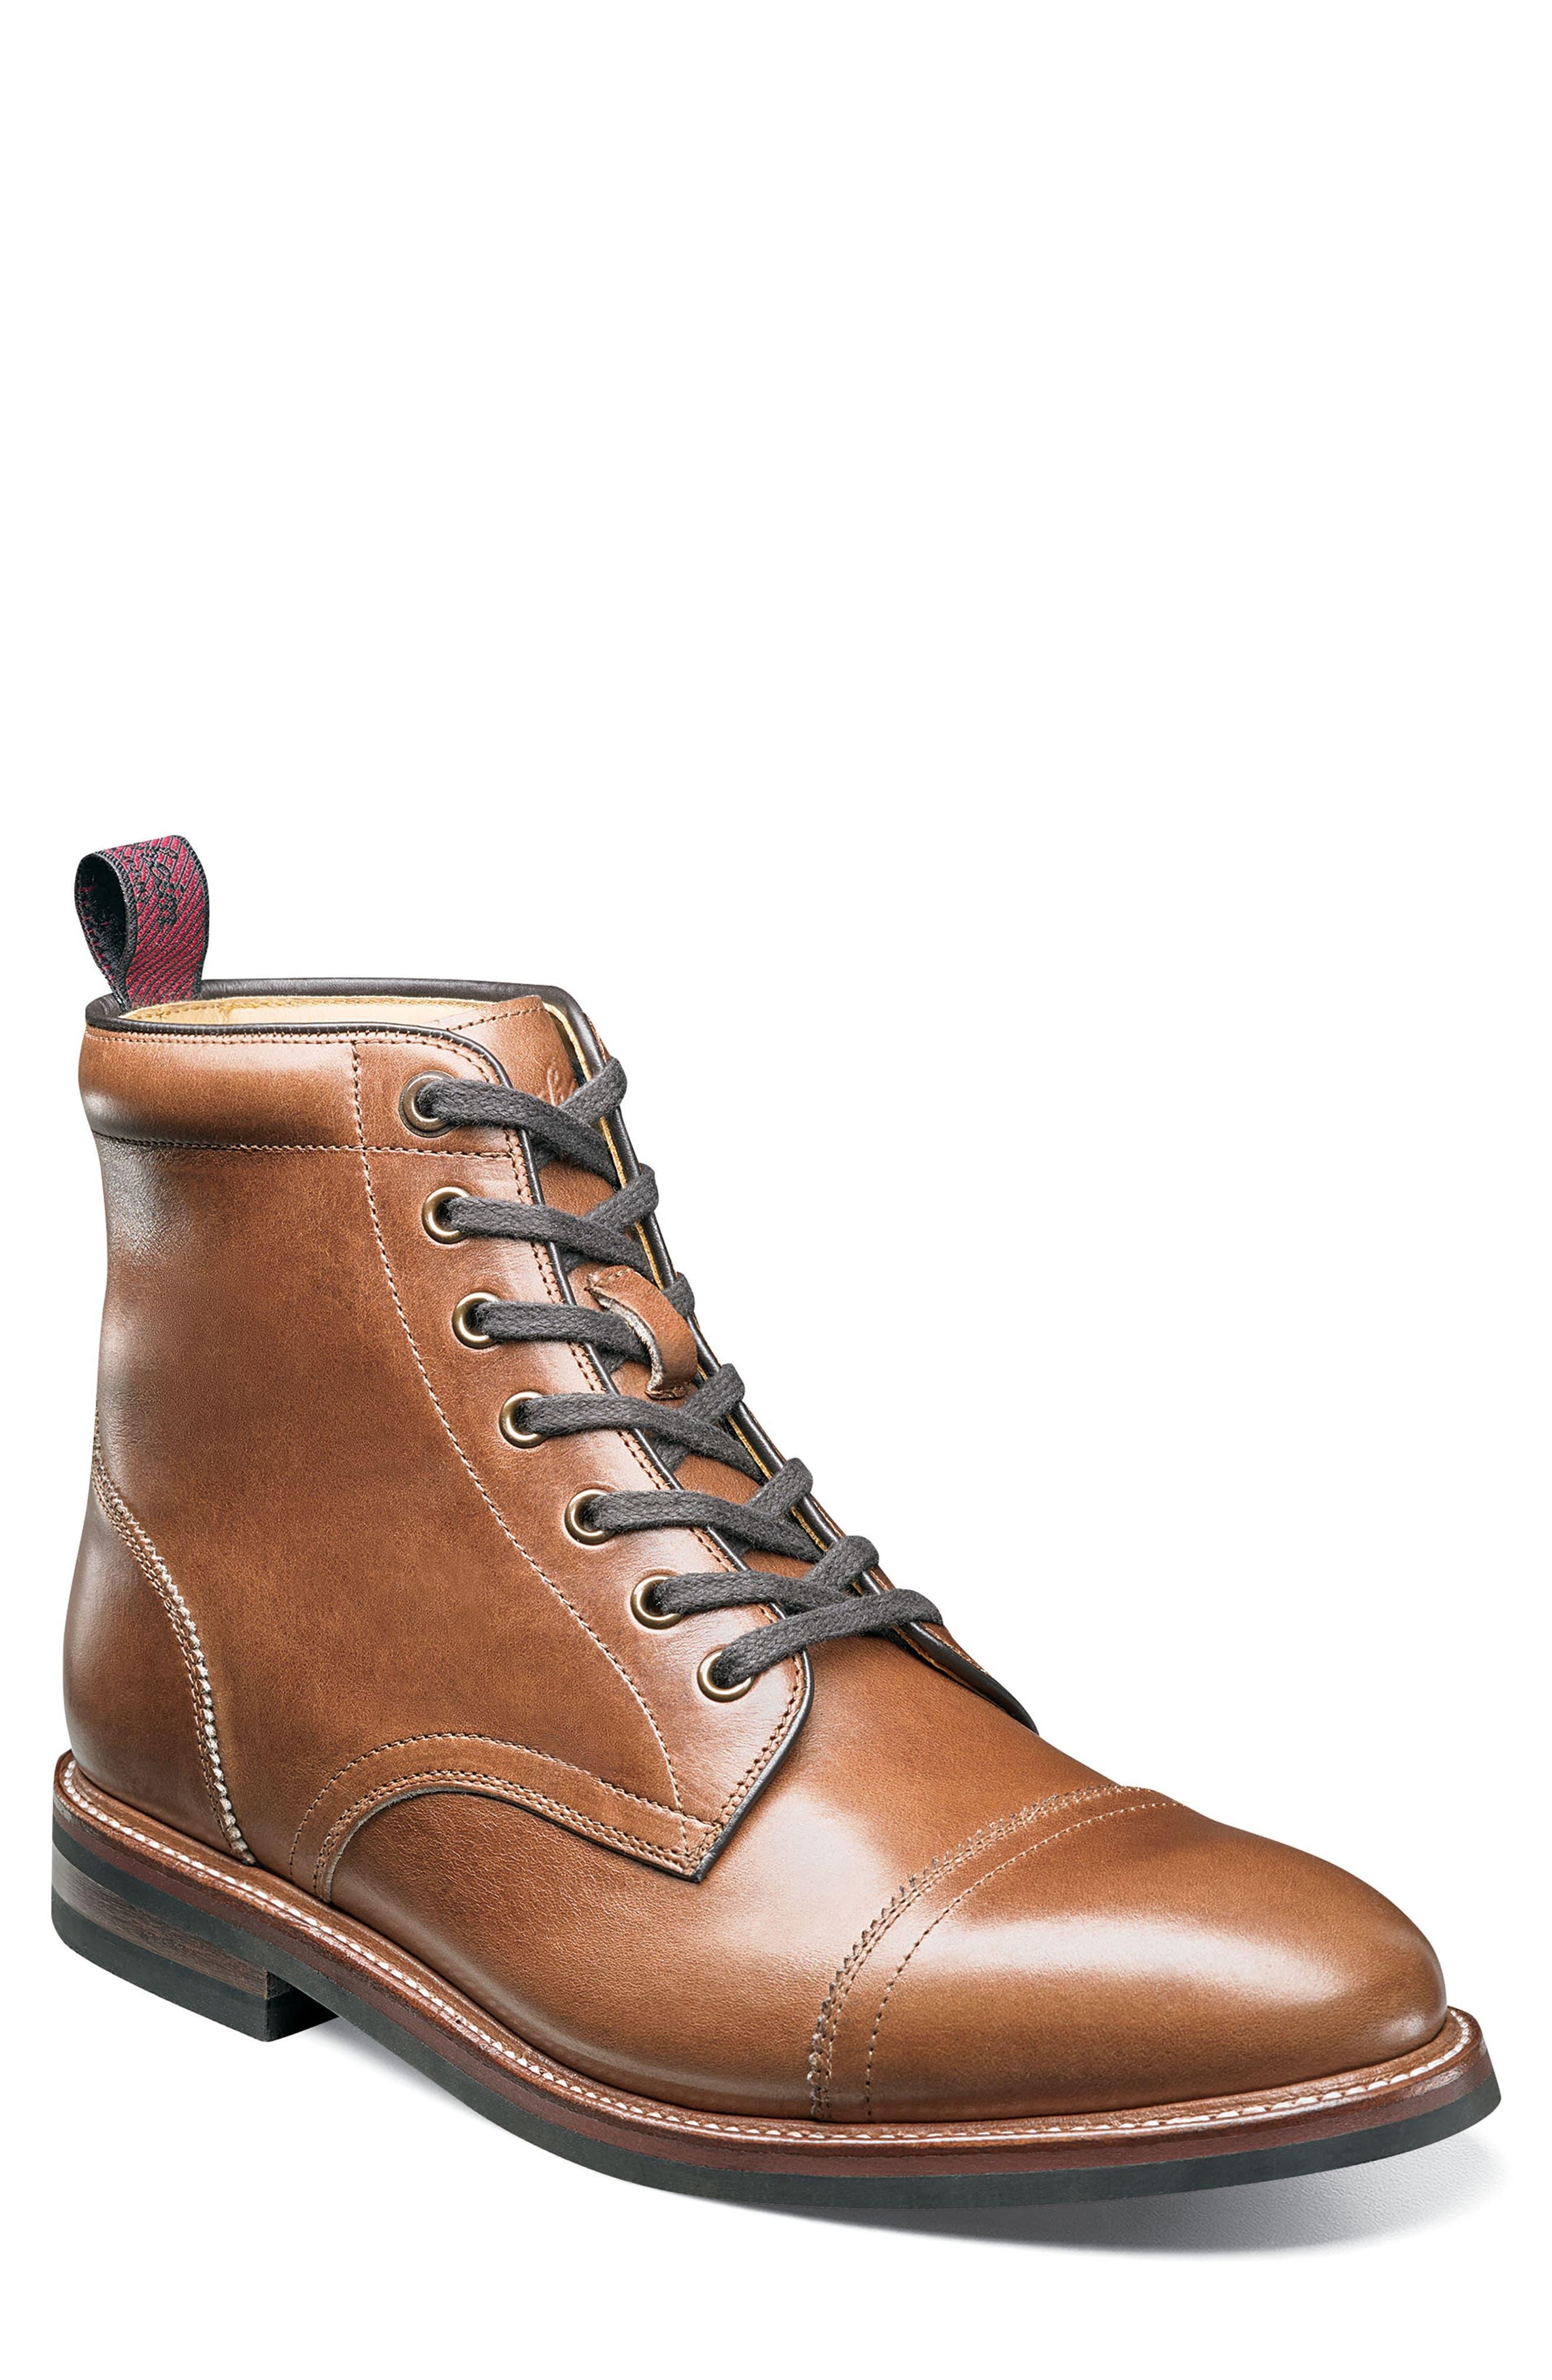 Florsheim Founcry Cap Toe Boot, Brown